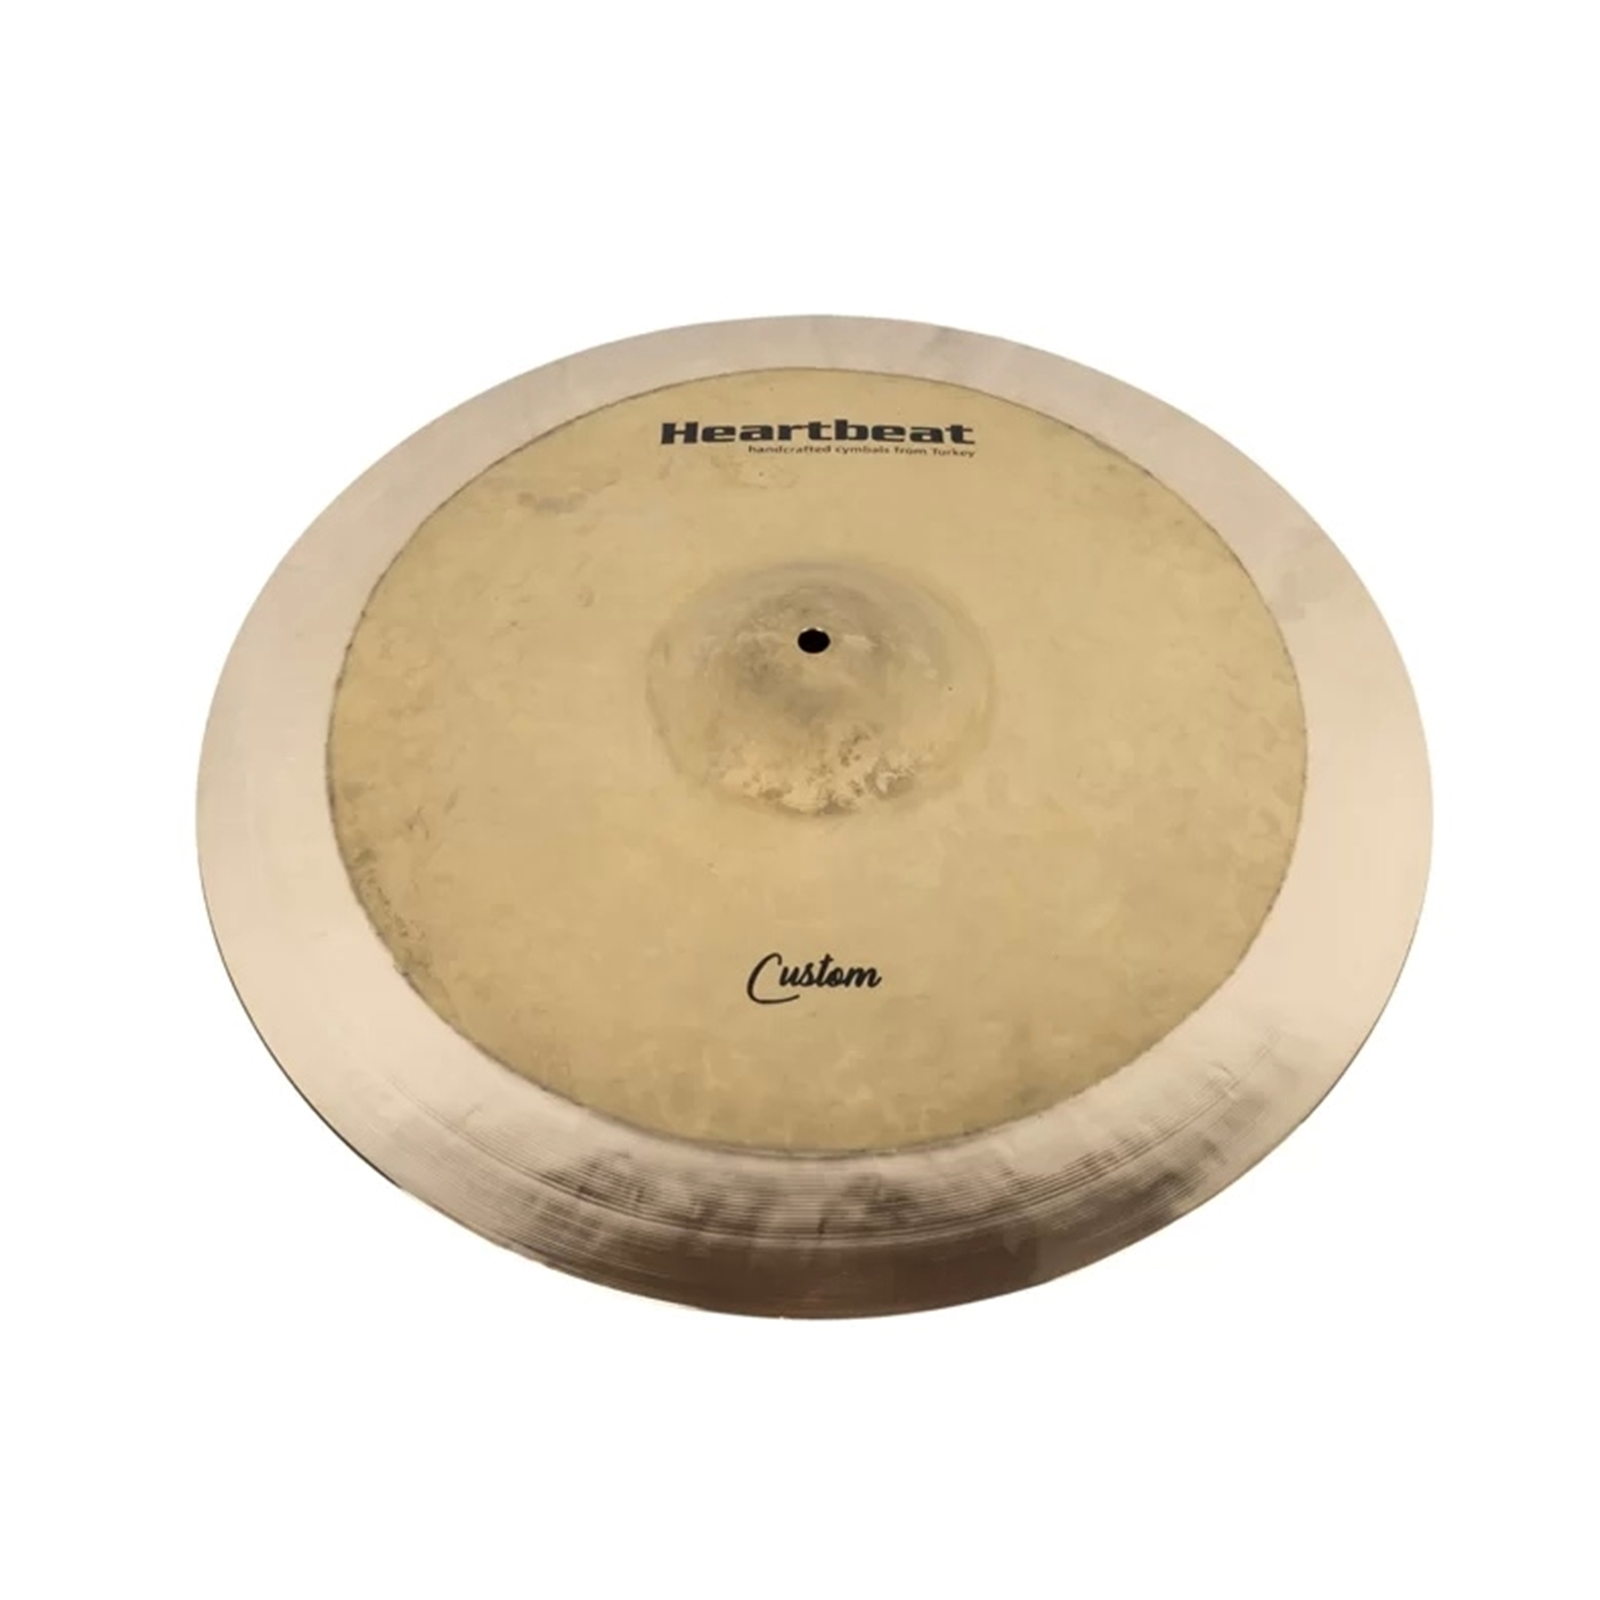 Heartbeat Custom Crash Cymbals